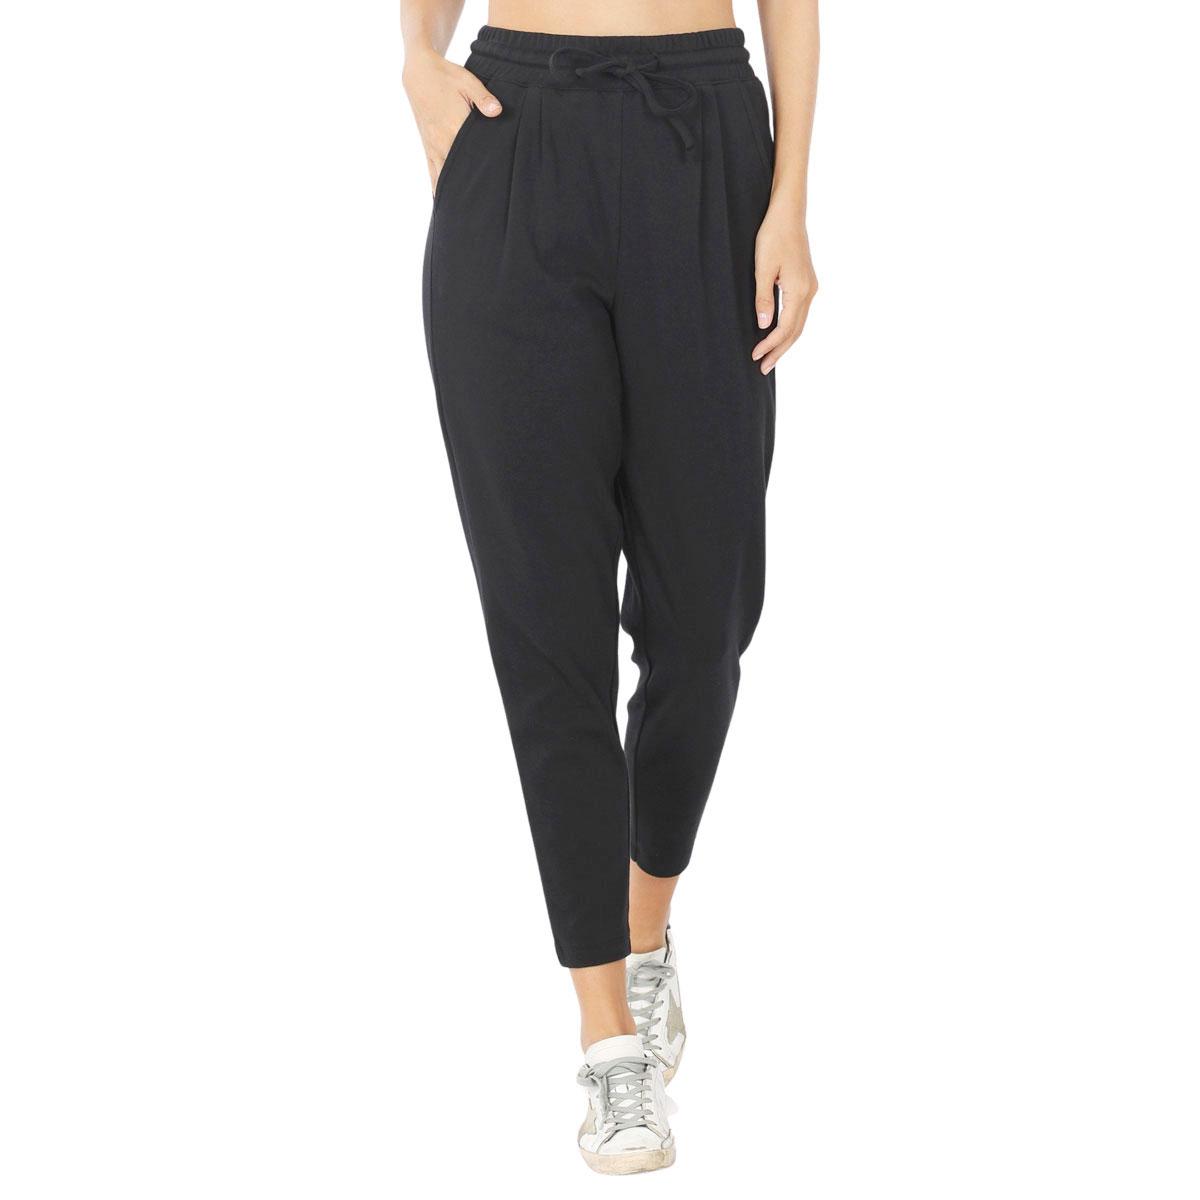 Pants - Cotton w/ Drawstring Waistband 32061 - BLACK Pants - Cotton w/ Drawstring Waistband 32061